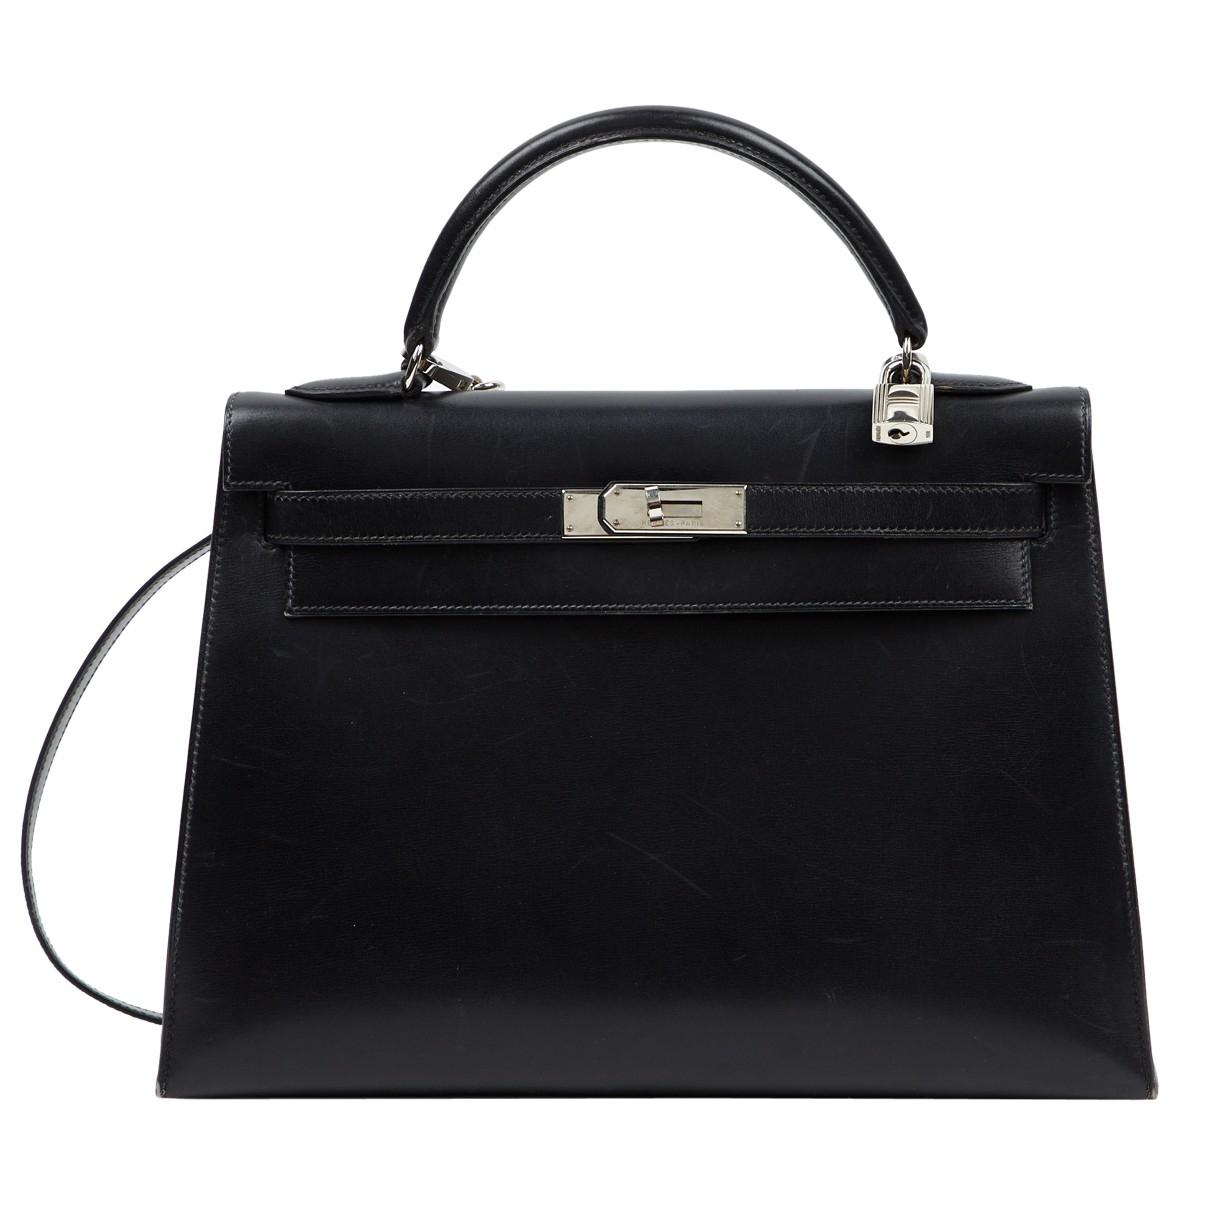 Hermes Kelly 32 Handtasche in  Schwarz Leder